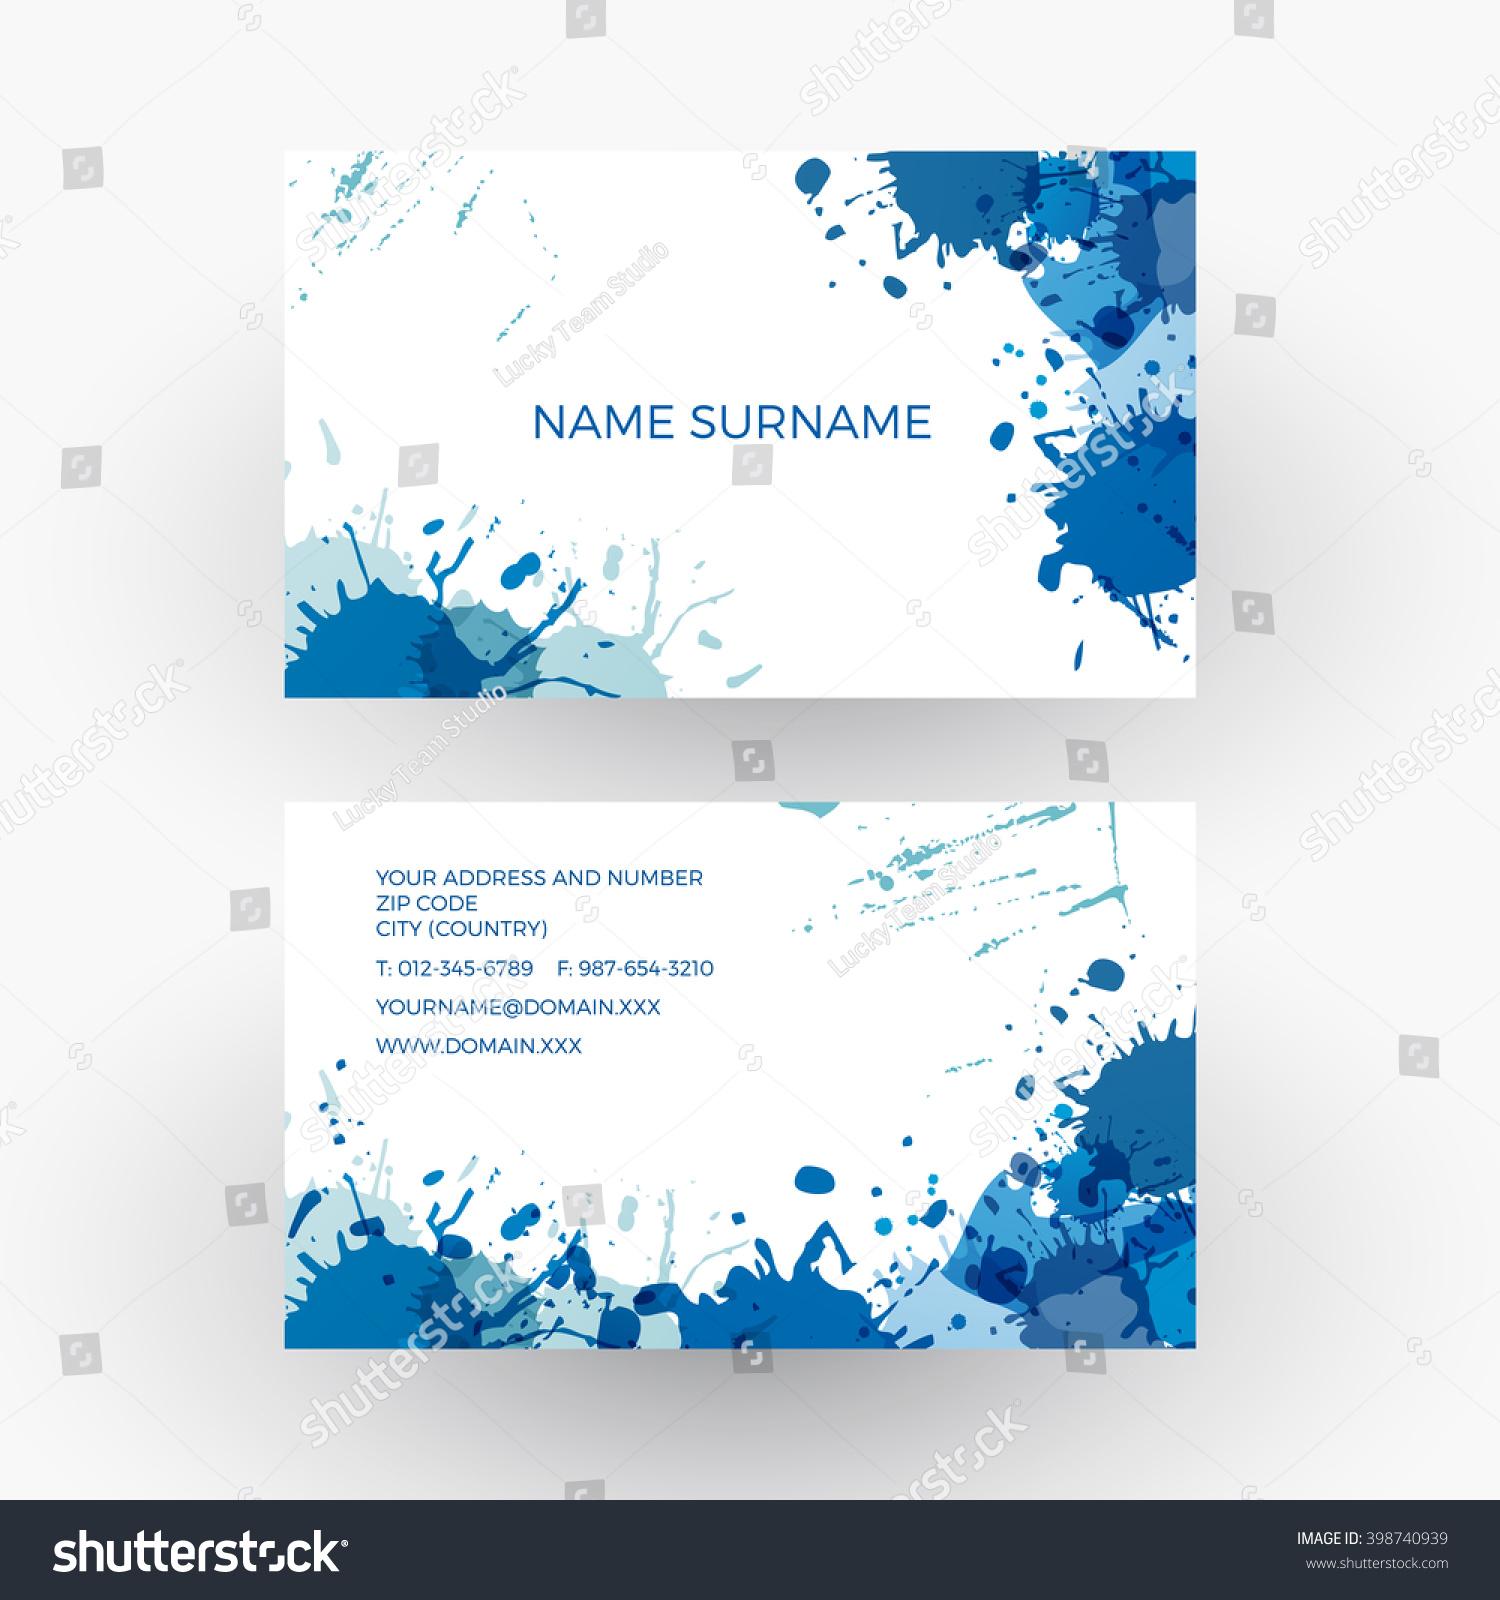 Vector Abstract Blue Splash Concept Painter Stock Vector